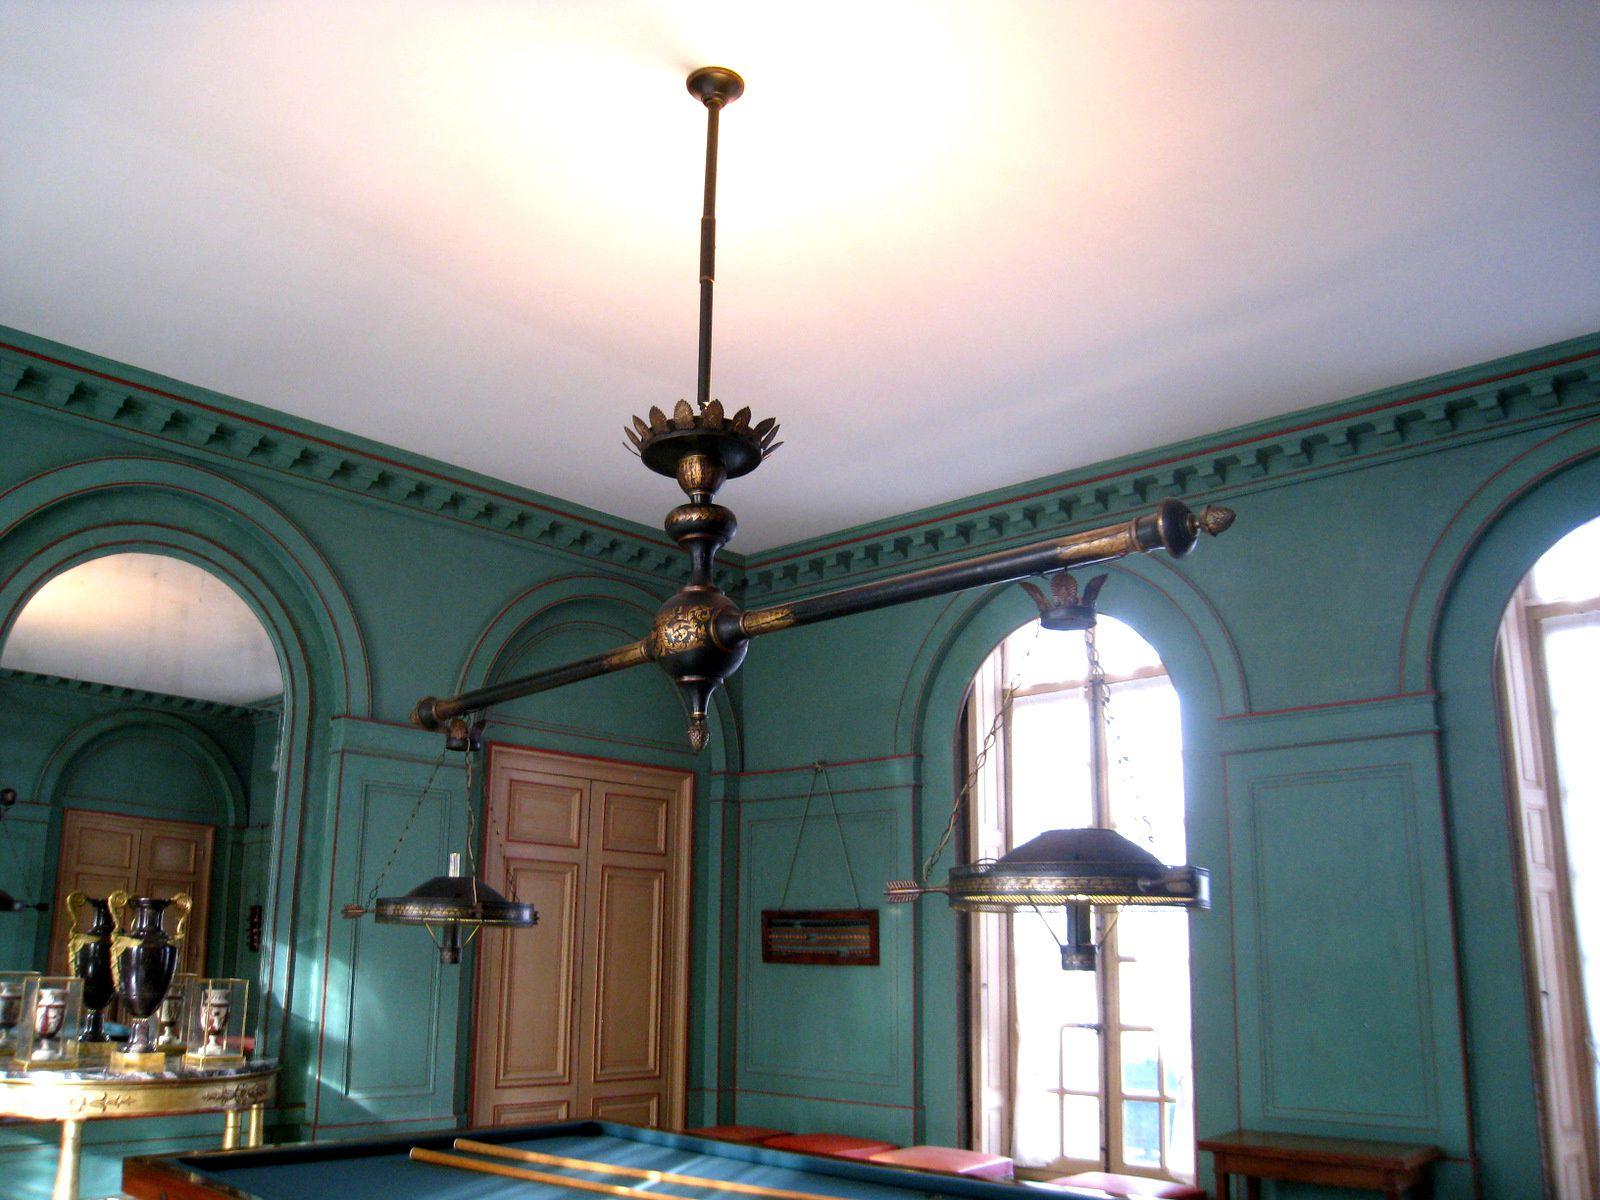 Salle de billard du château de Malmaison